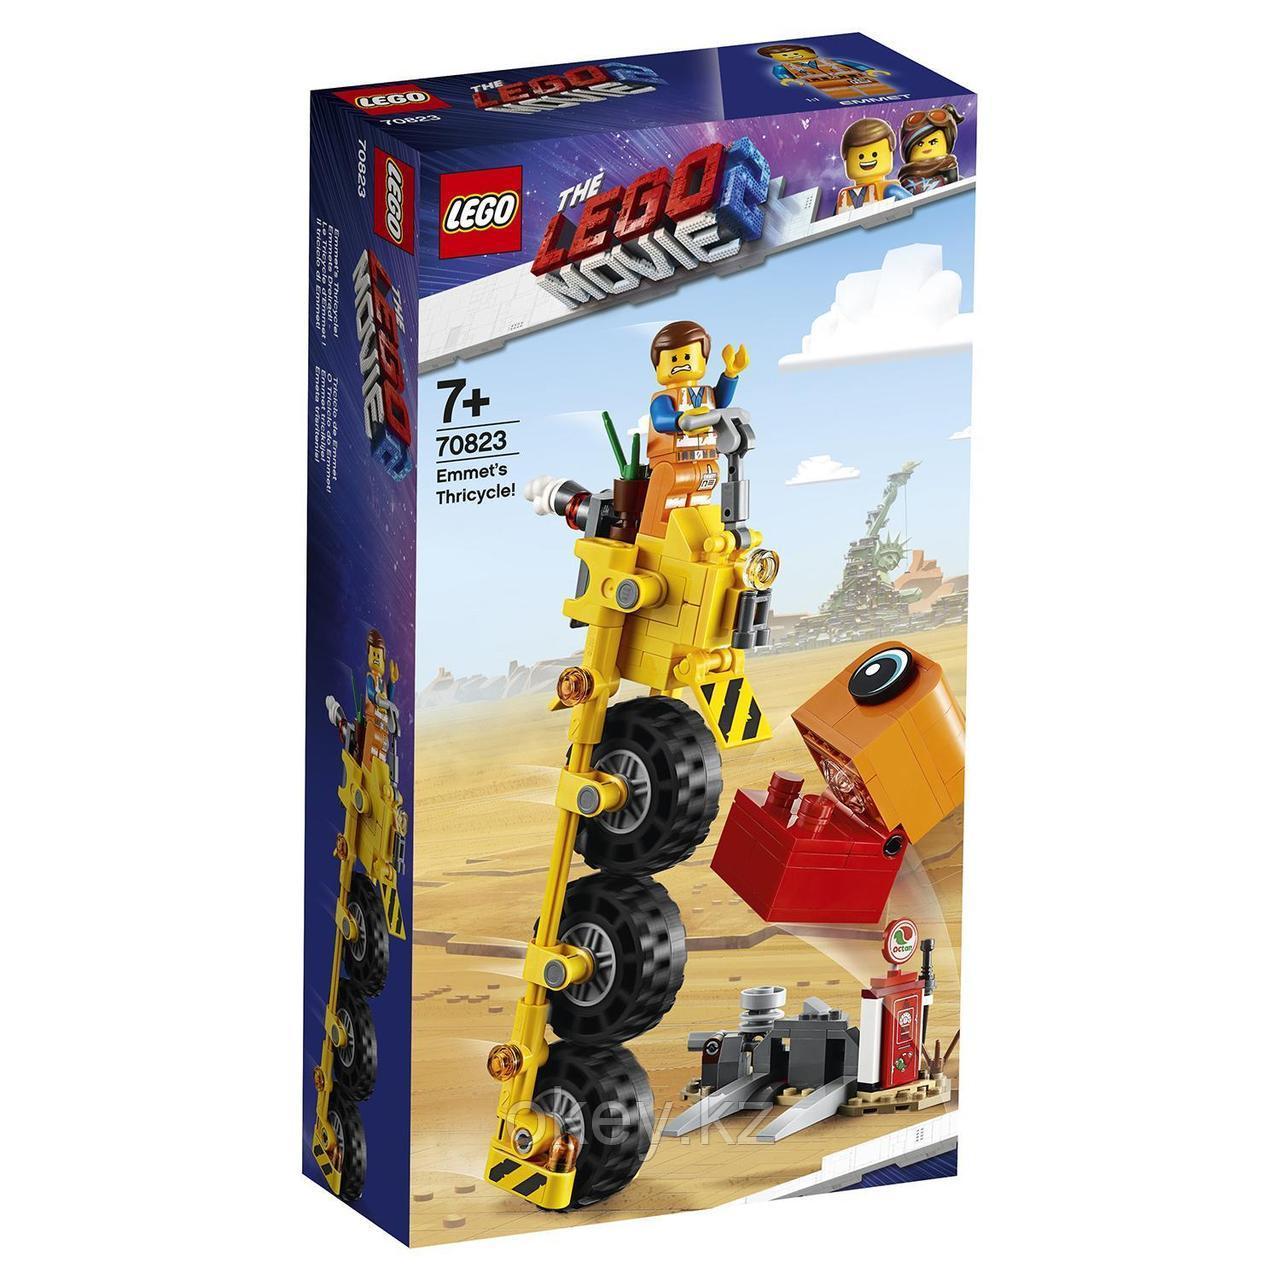 LEGO Movie: Трехколёсный велосипед Эммета 70823